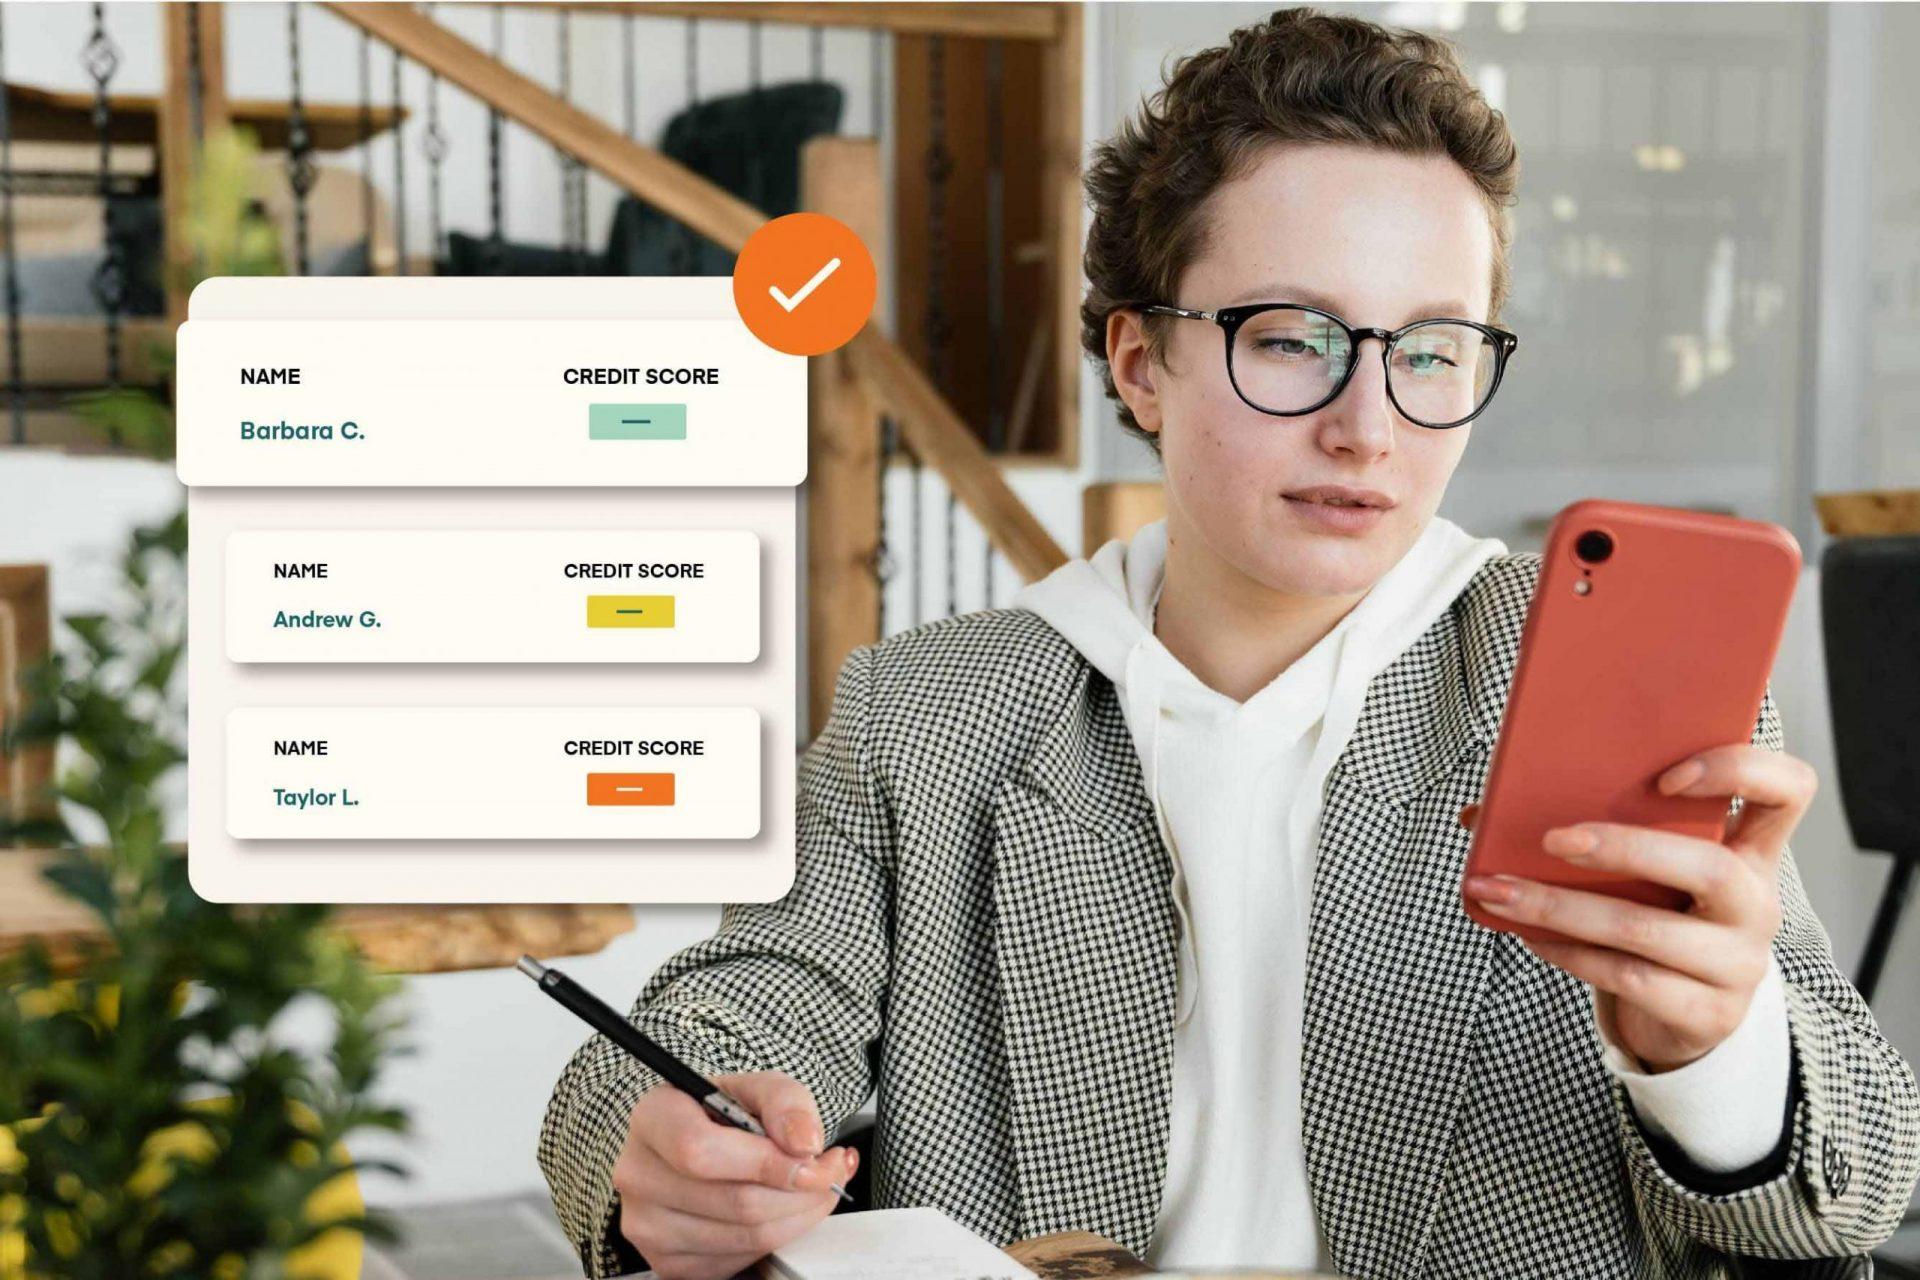 woman looking at renter applicants credit score